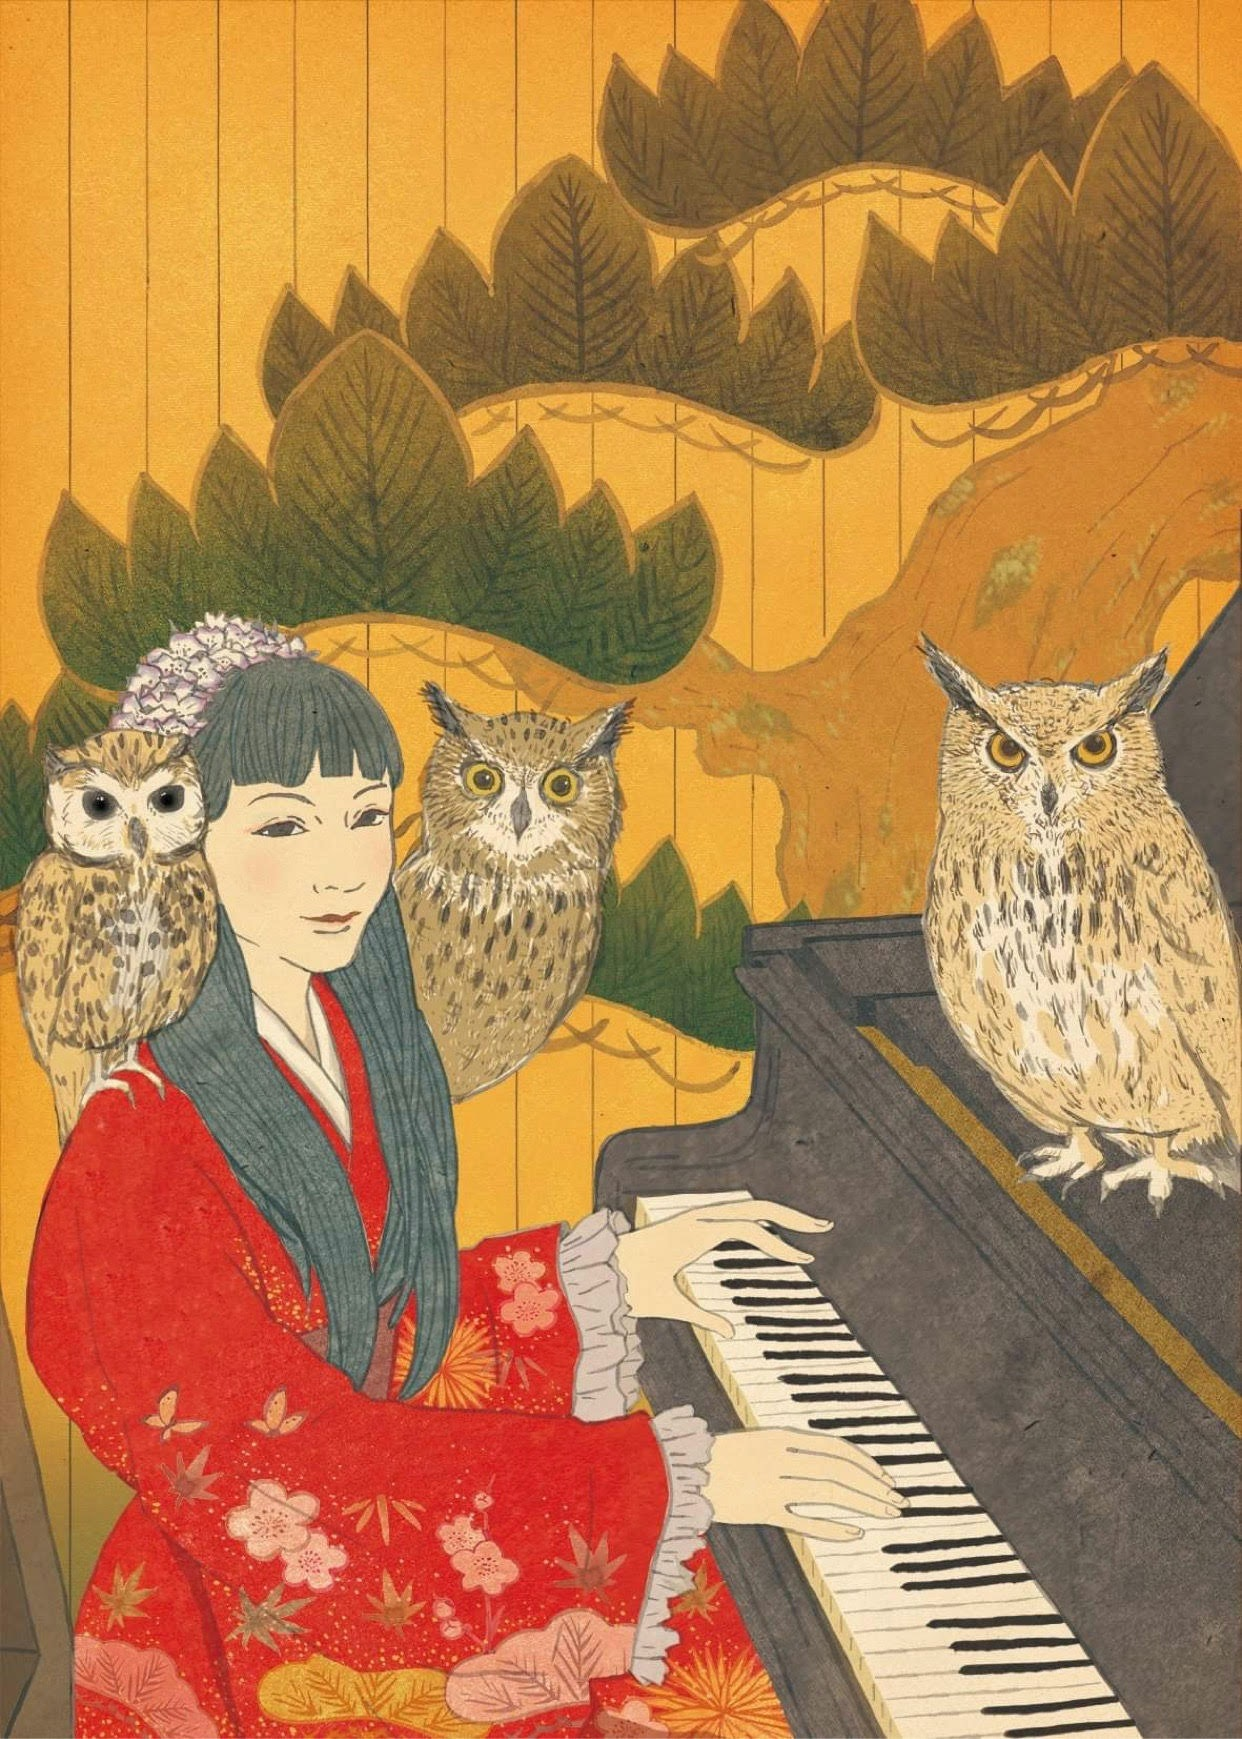 Shiho Yabuki. Illustration by Non Nakagawa.